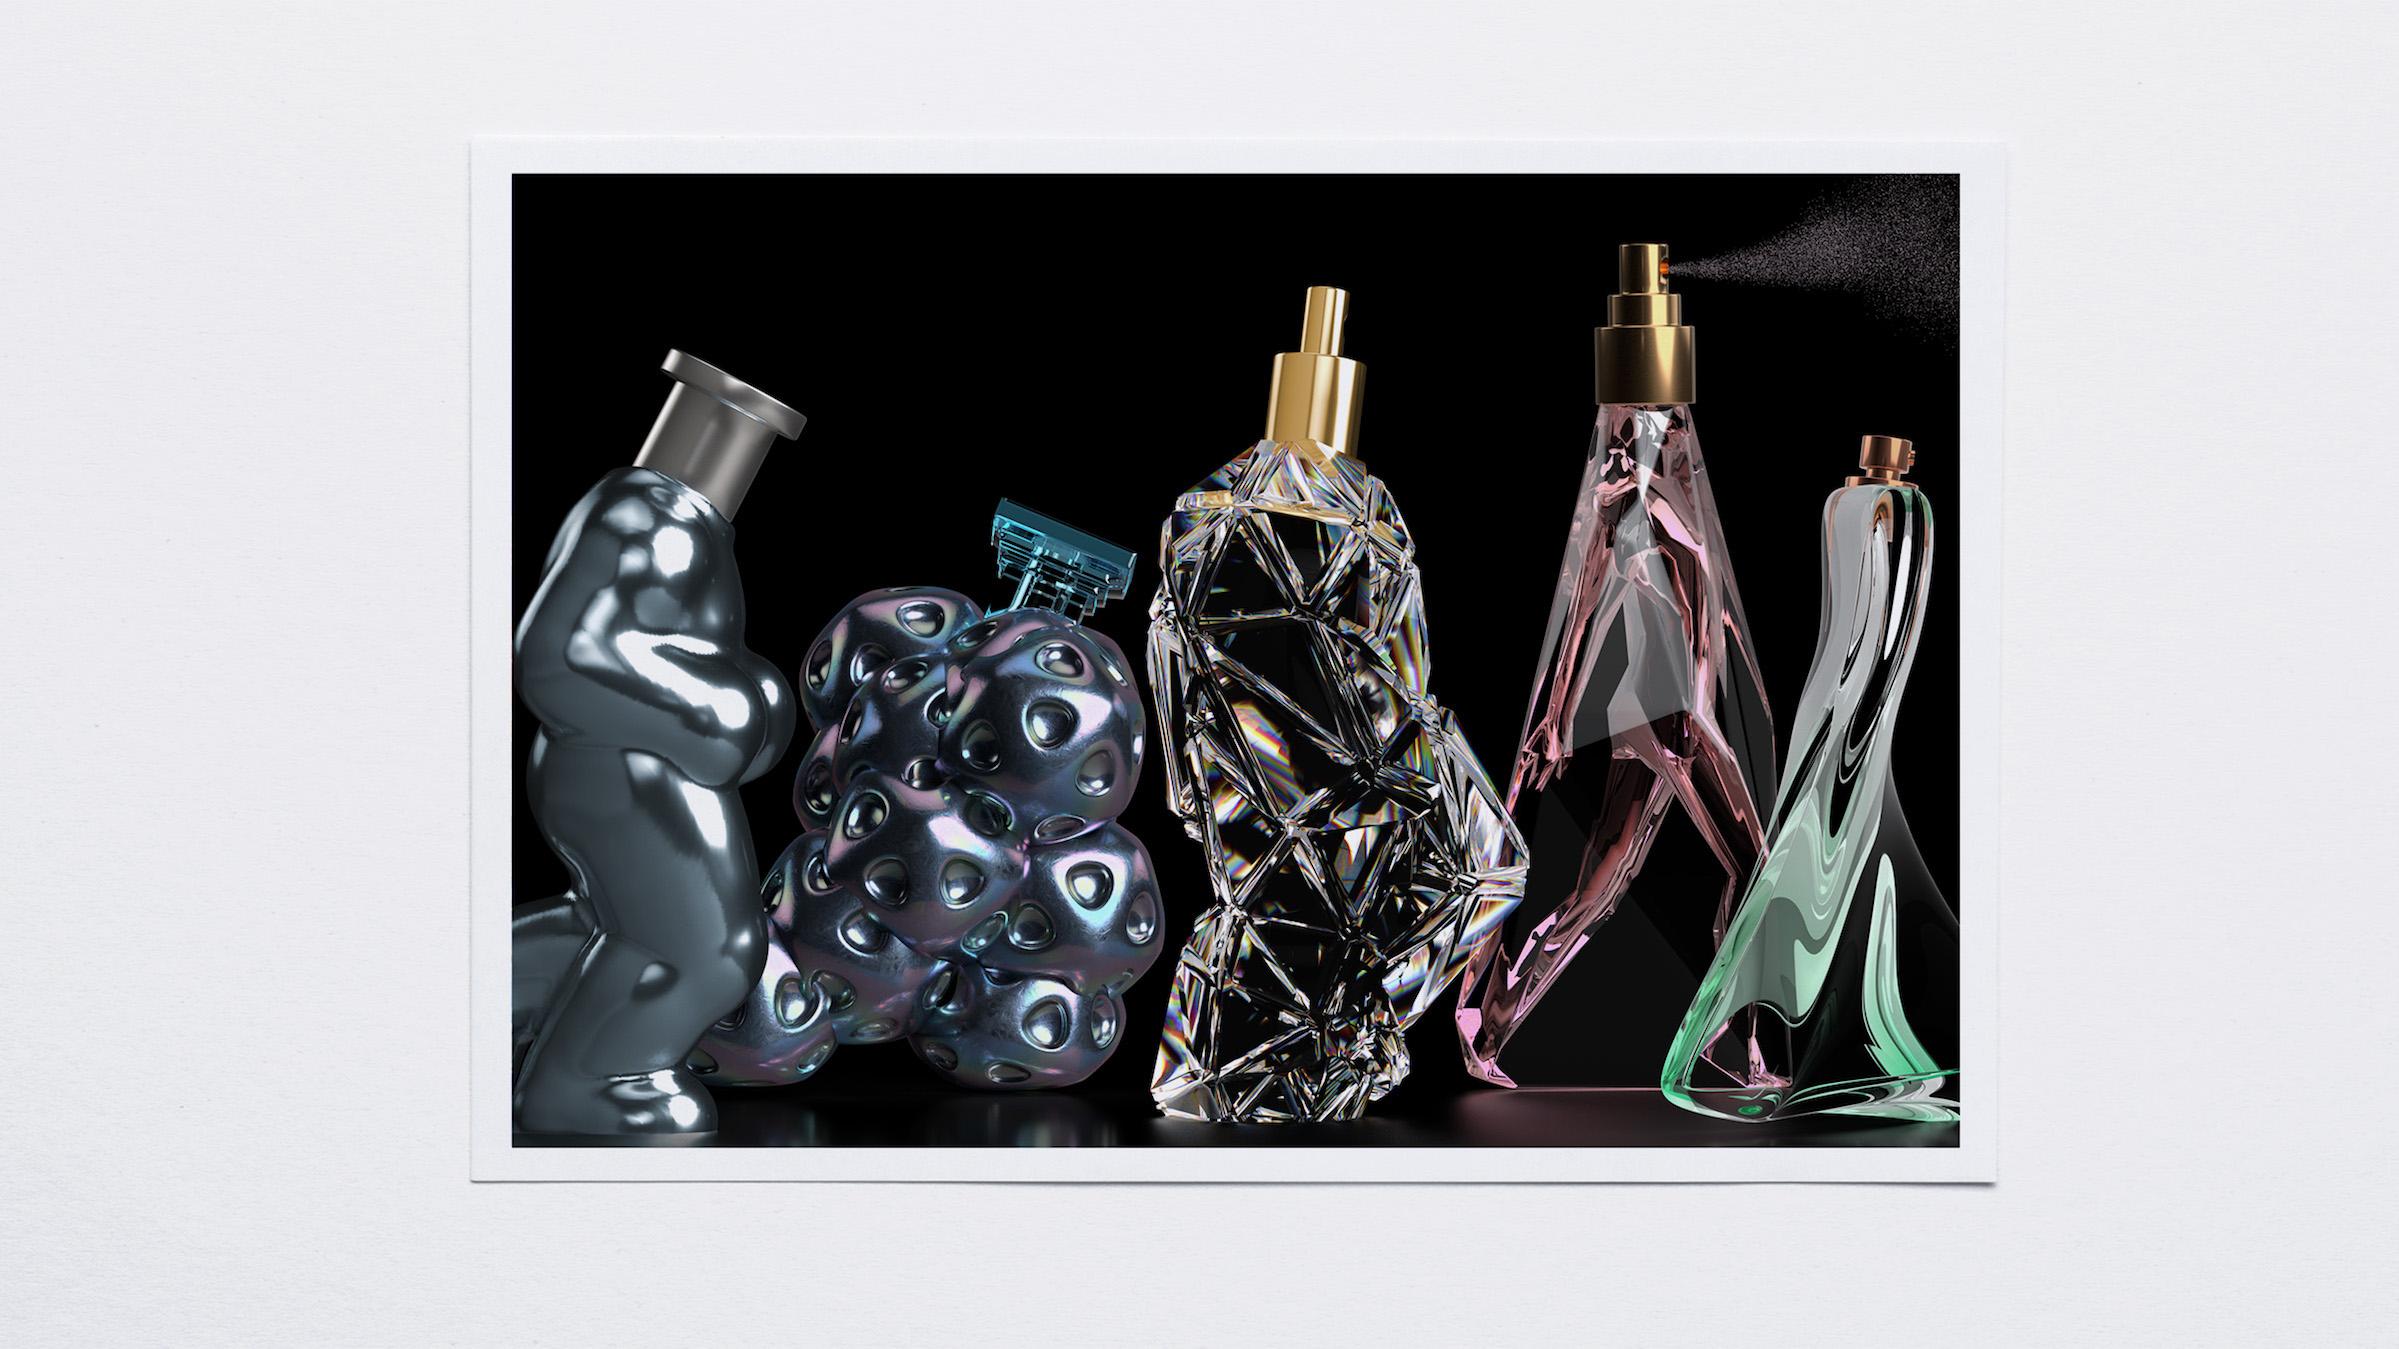 Superconsumers (Perfume)